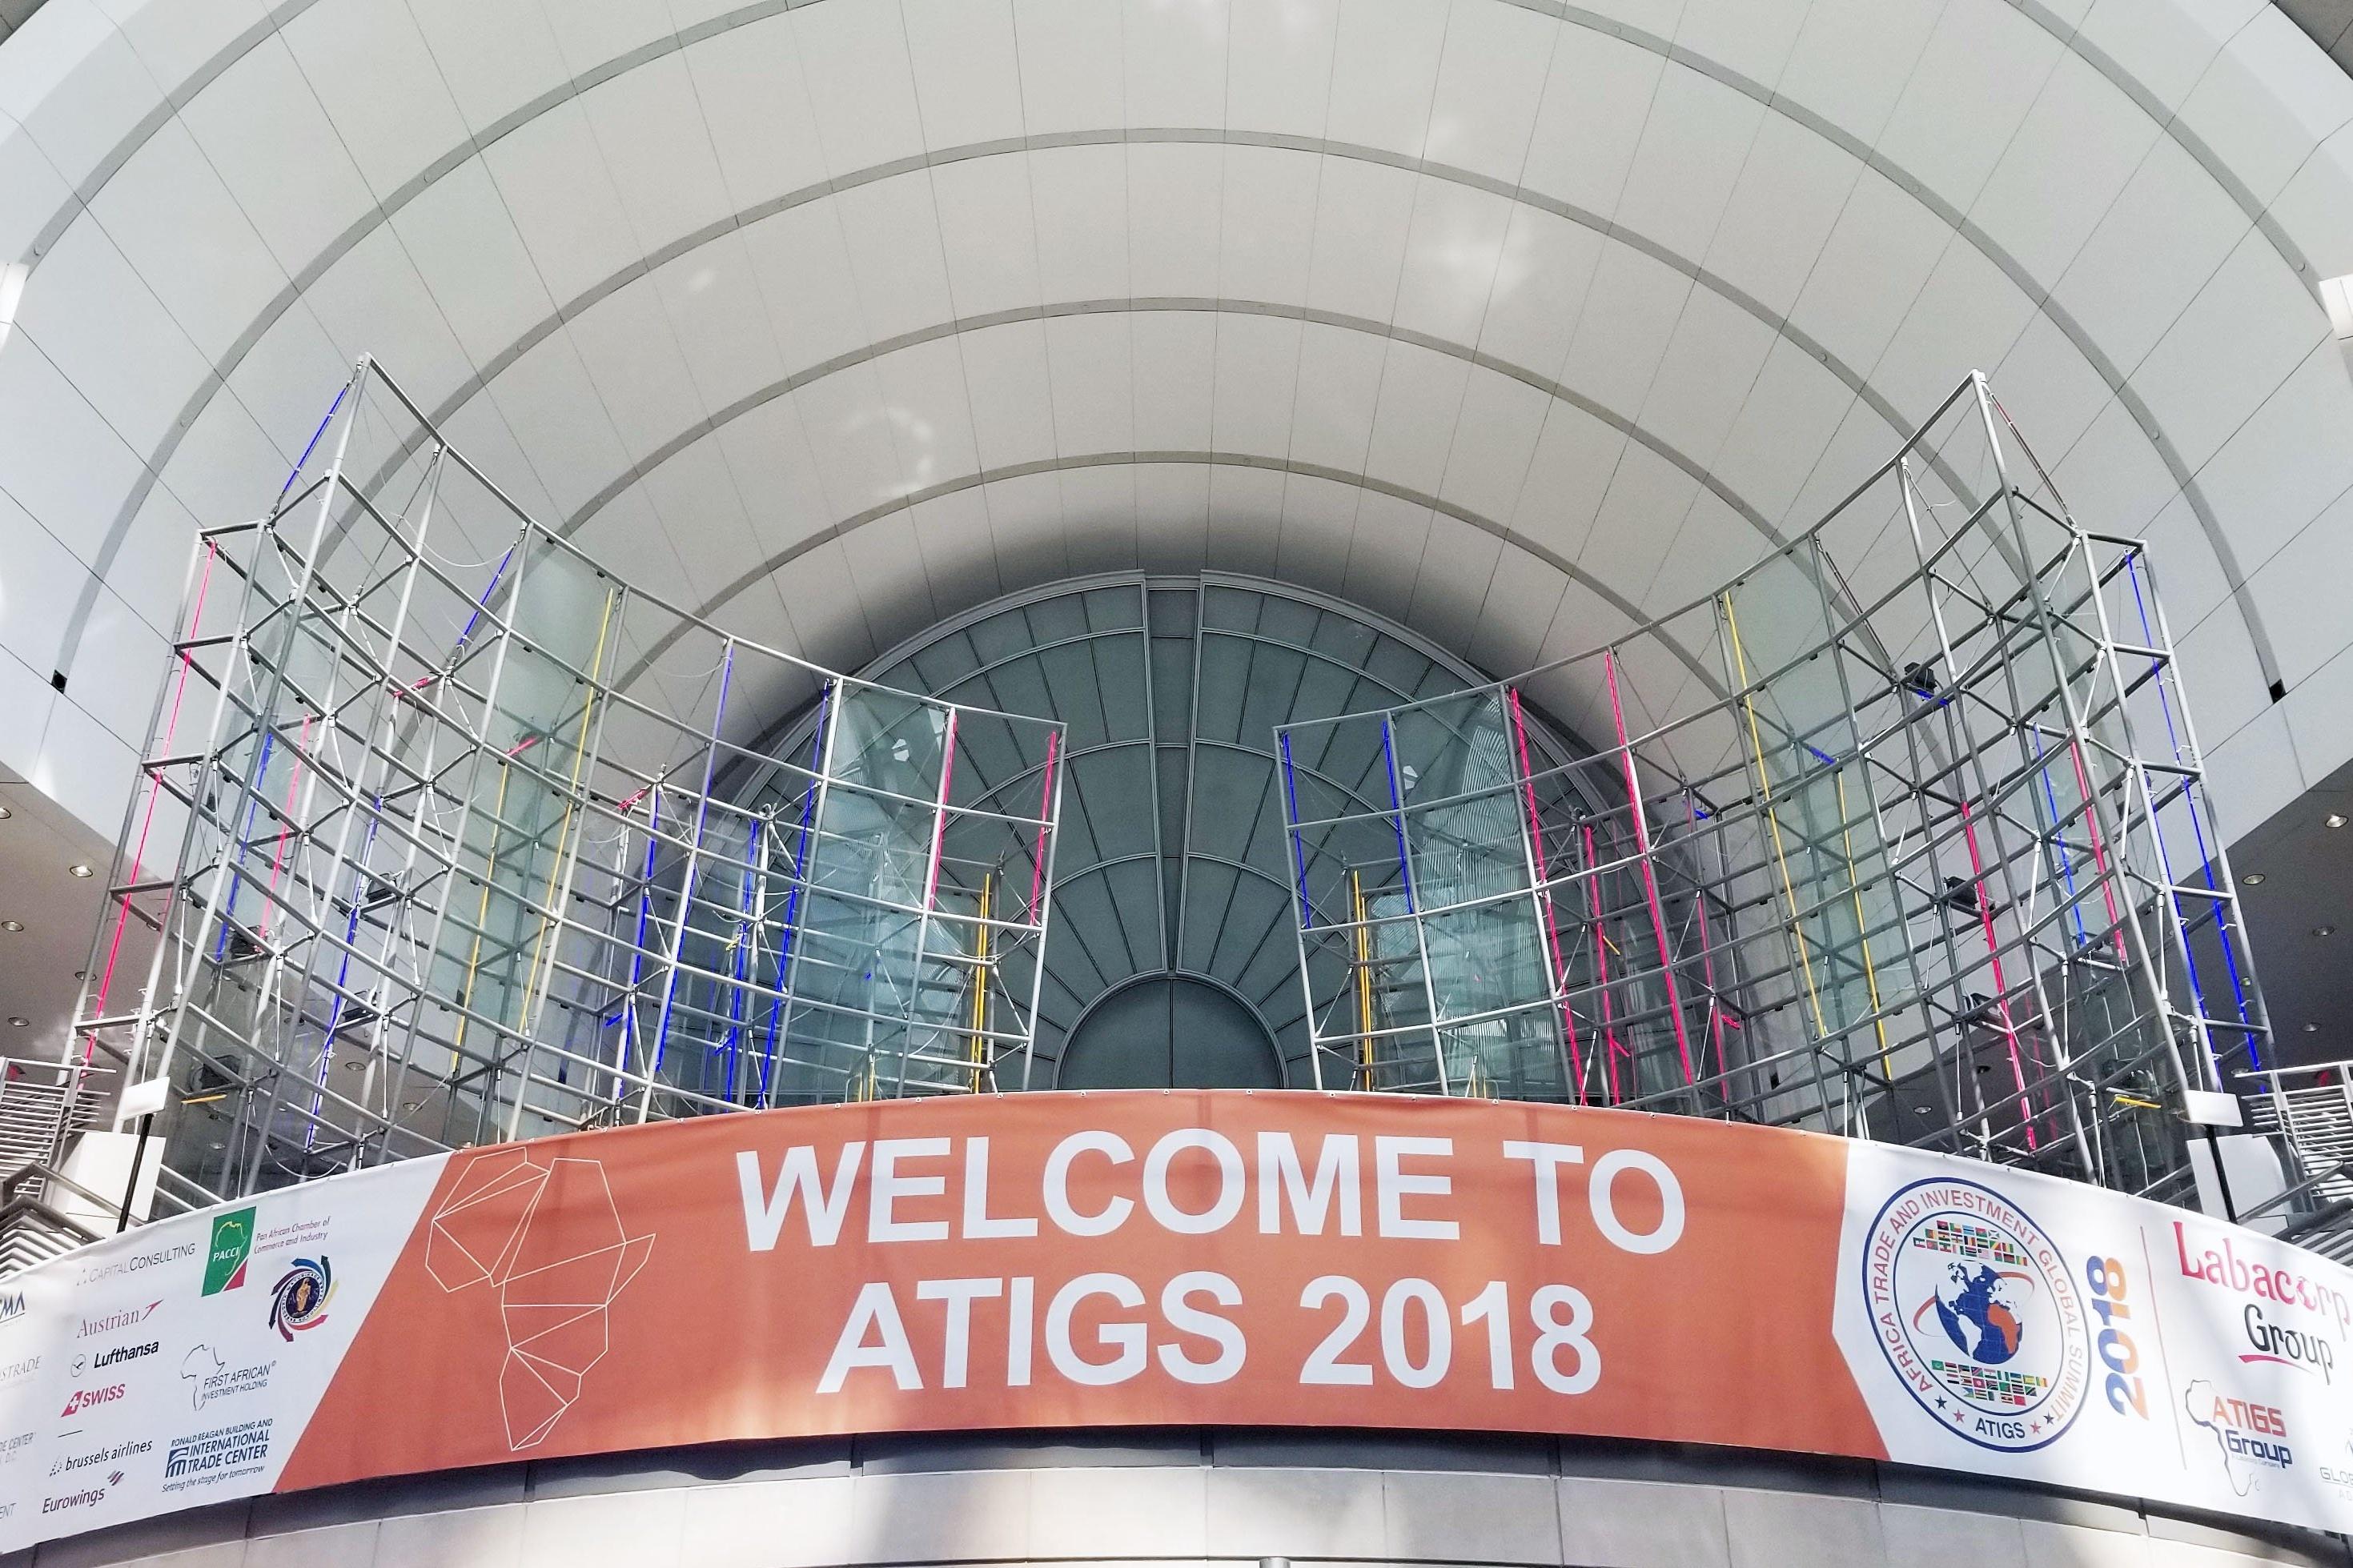 ATIGS 2018